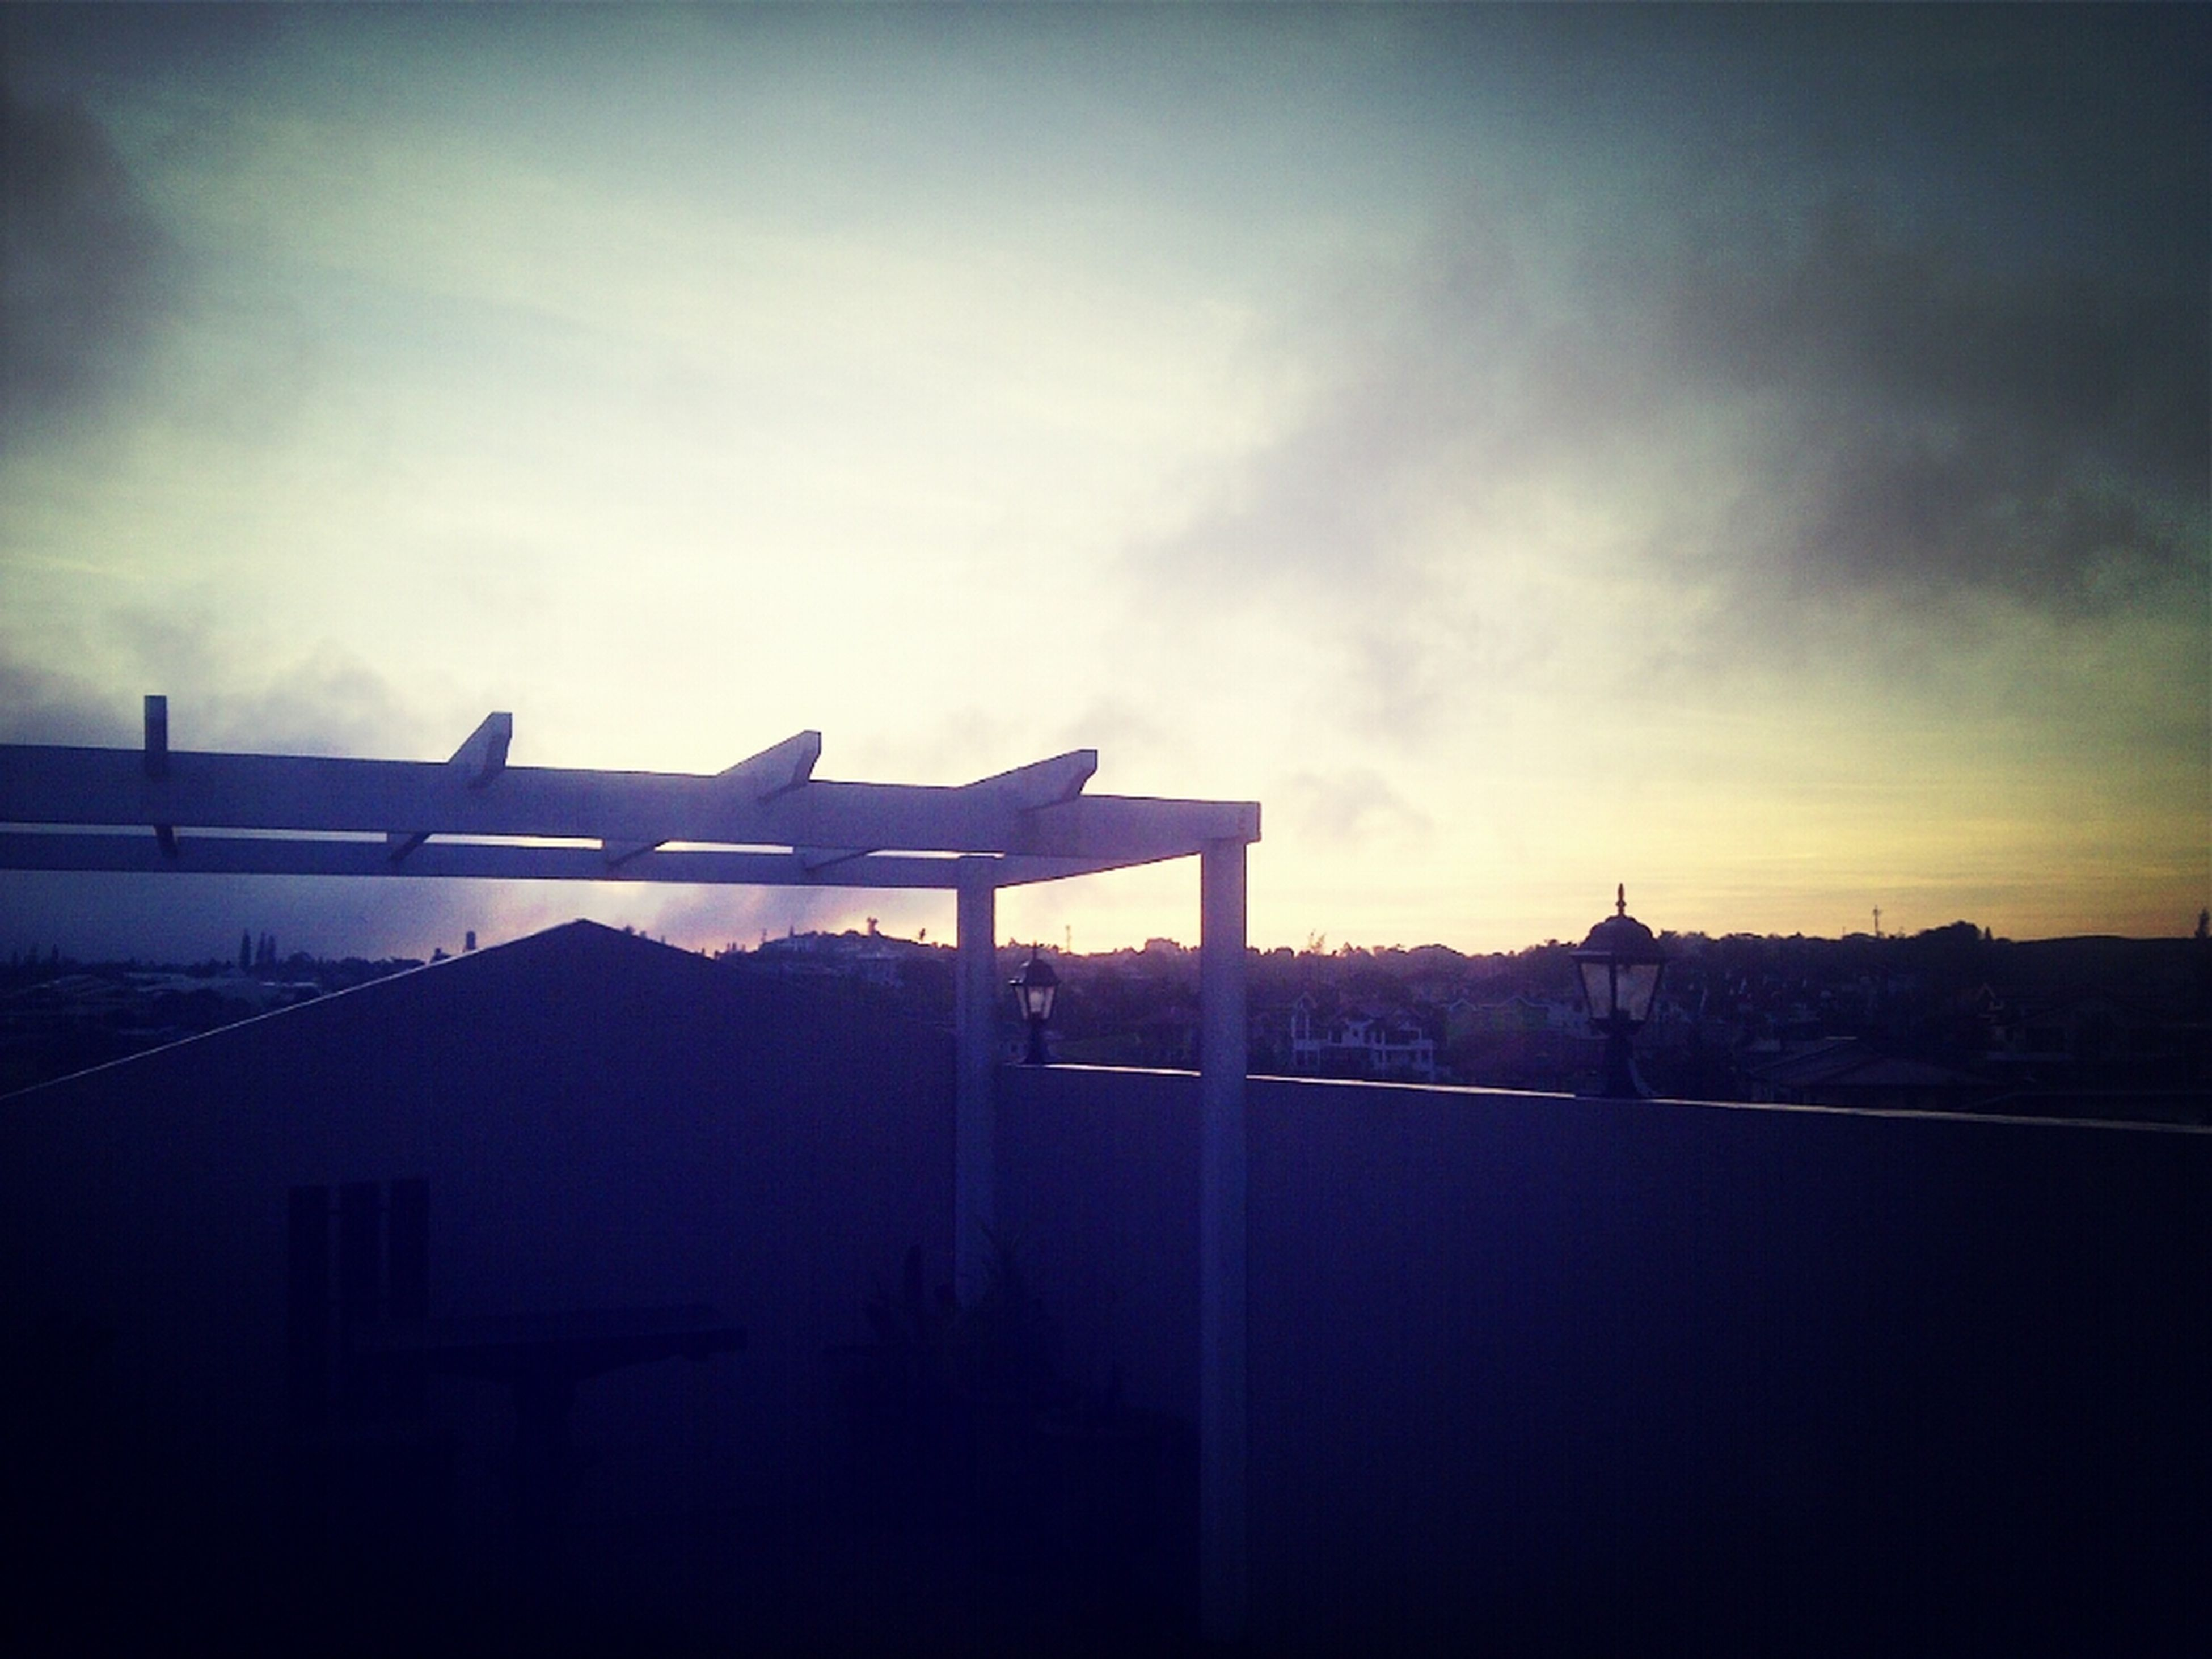 architecture, built structure, building exterior, sky, water, silhouette, sunset, cloud - sky, railing, connection, sea, bridge - man made structure, cloud, dusk, river, outdoors, bridge, city, no people, nature